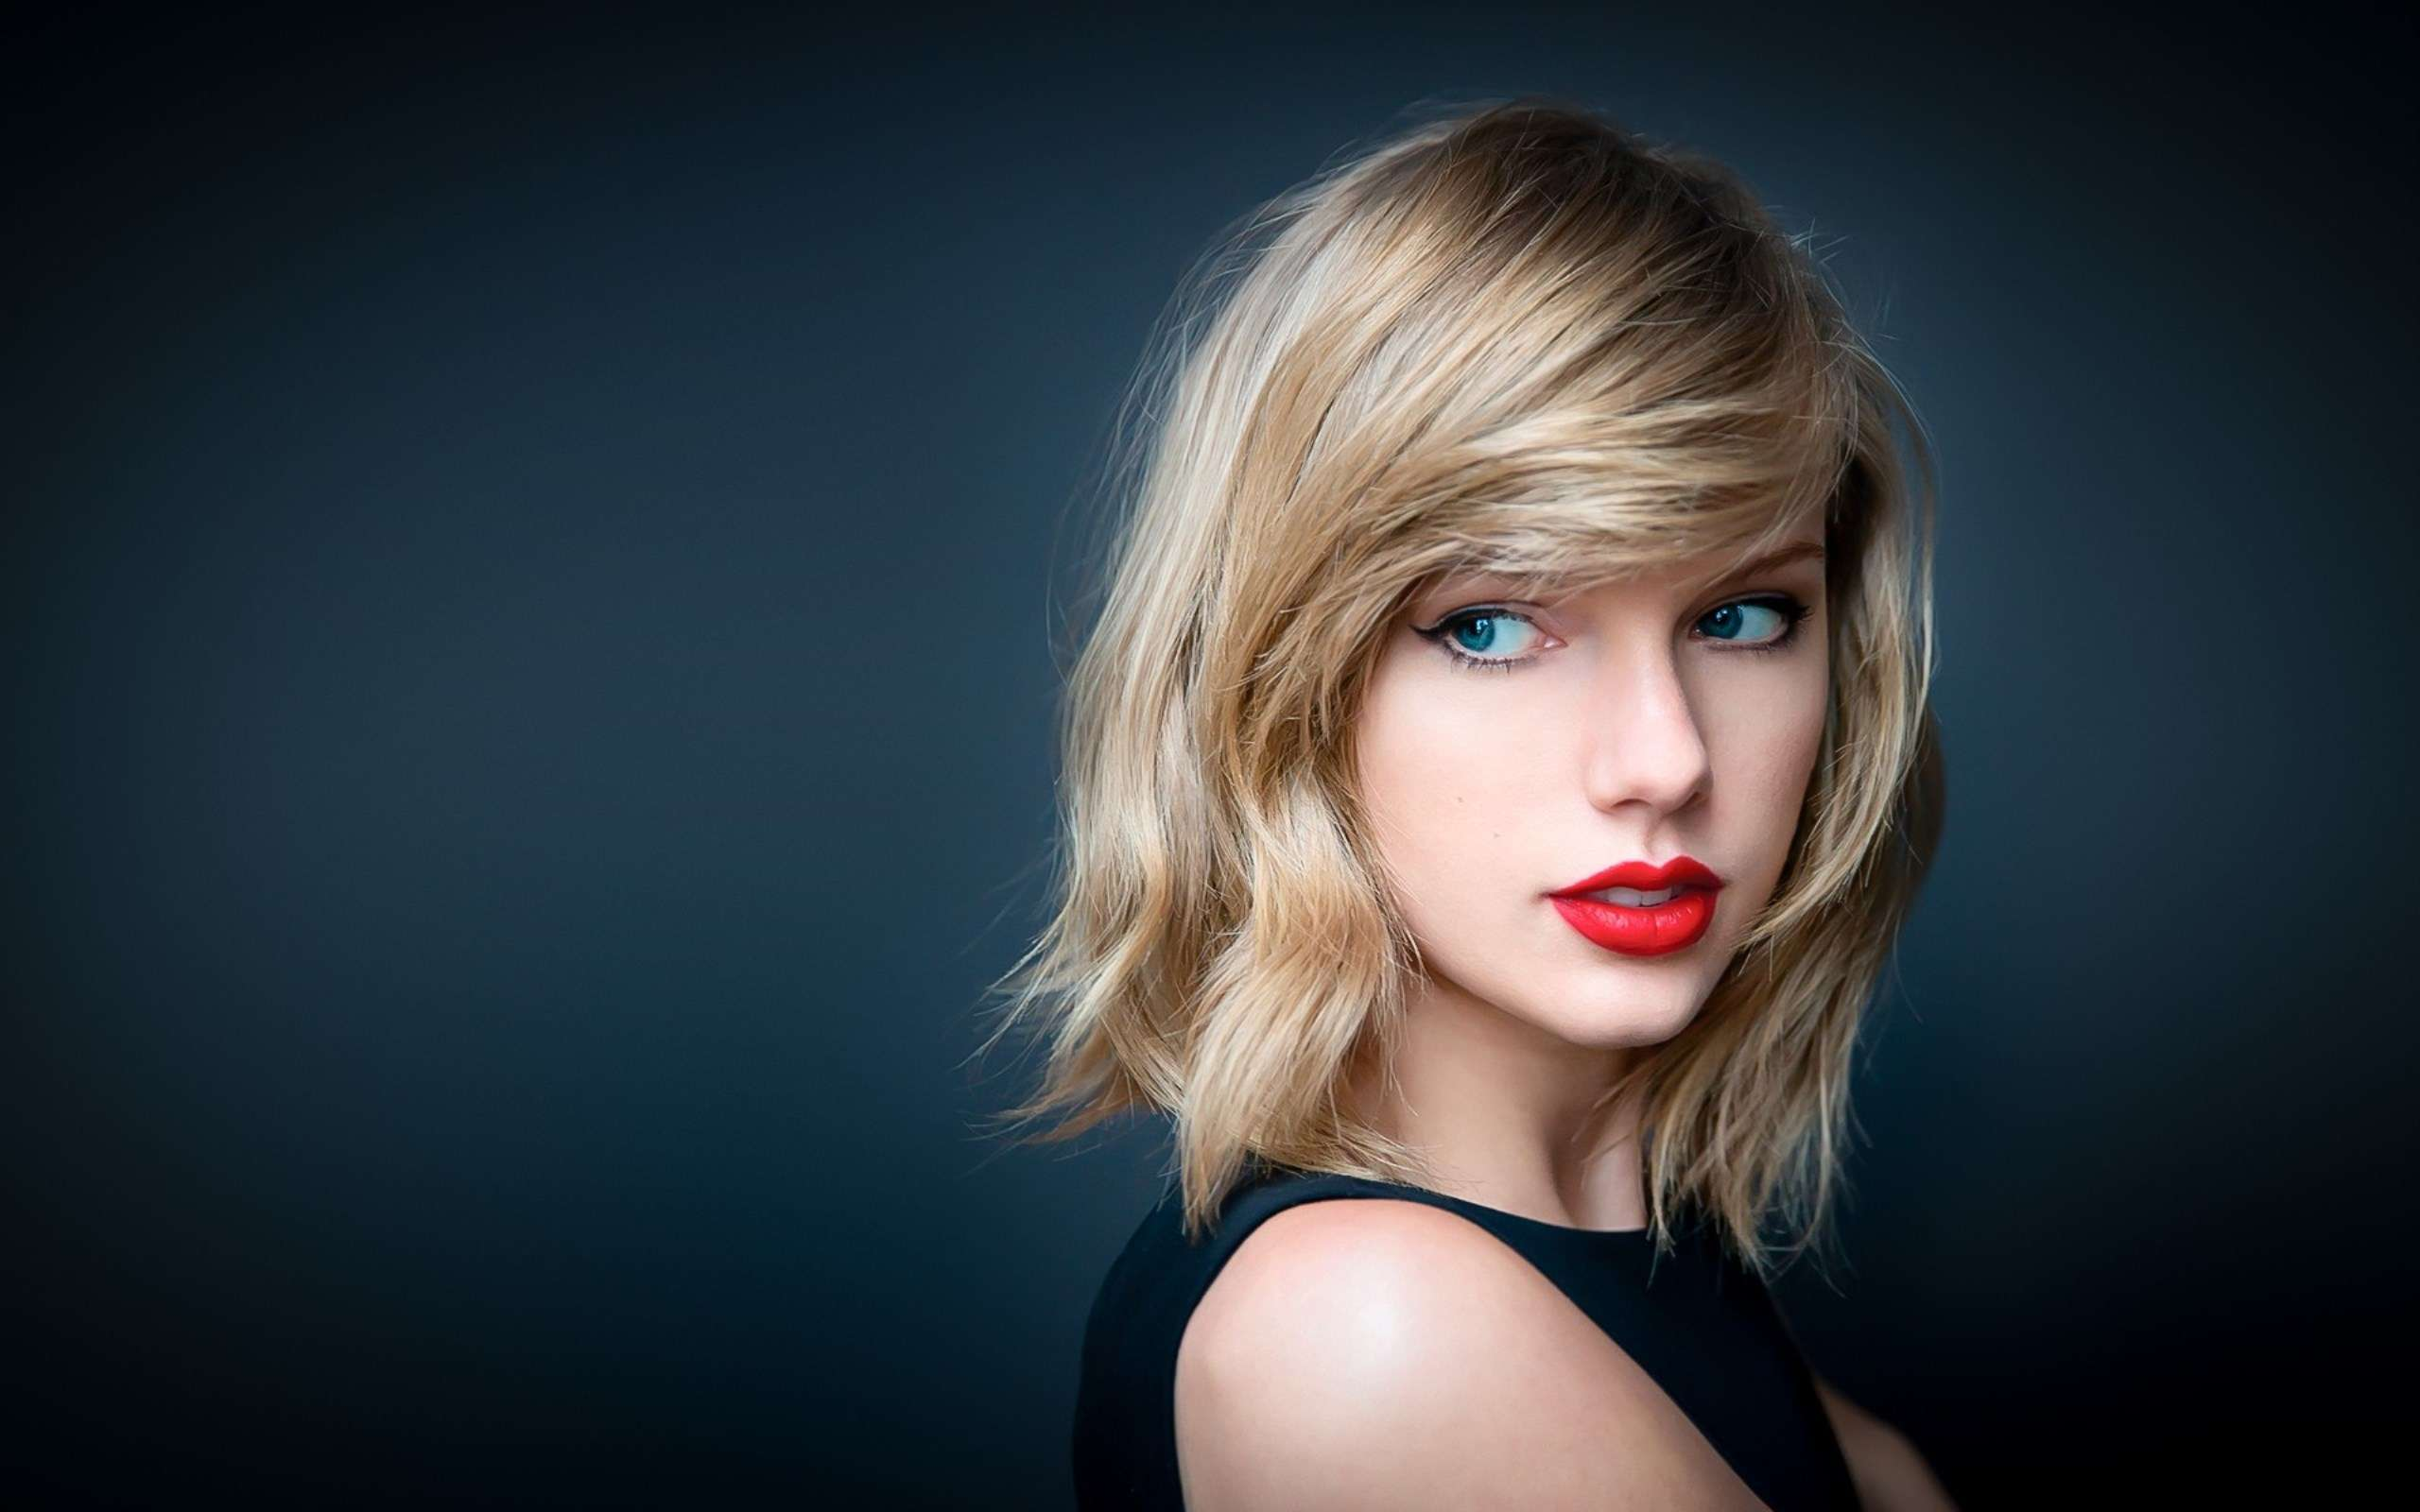 「Taylor Swift」の画像検索結果